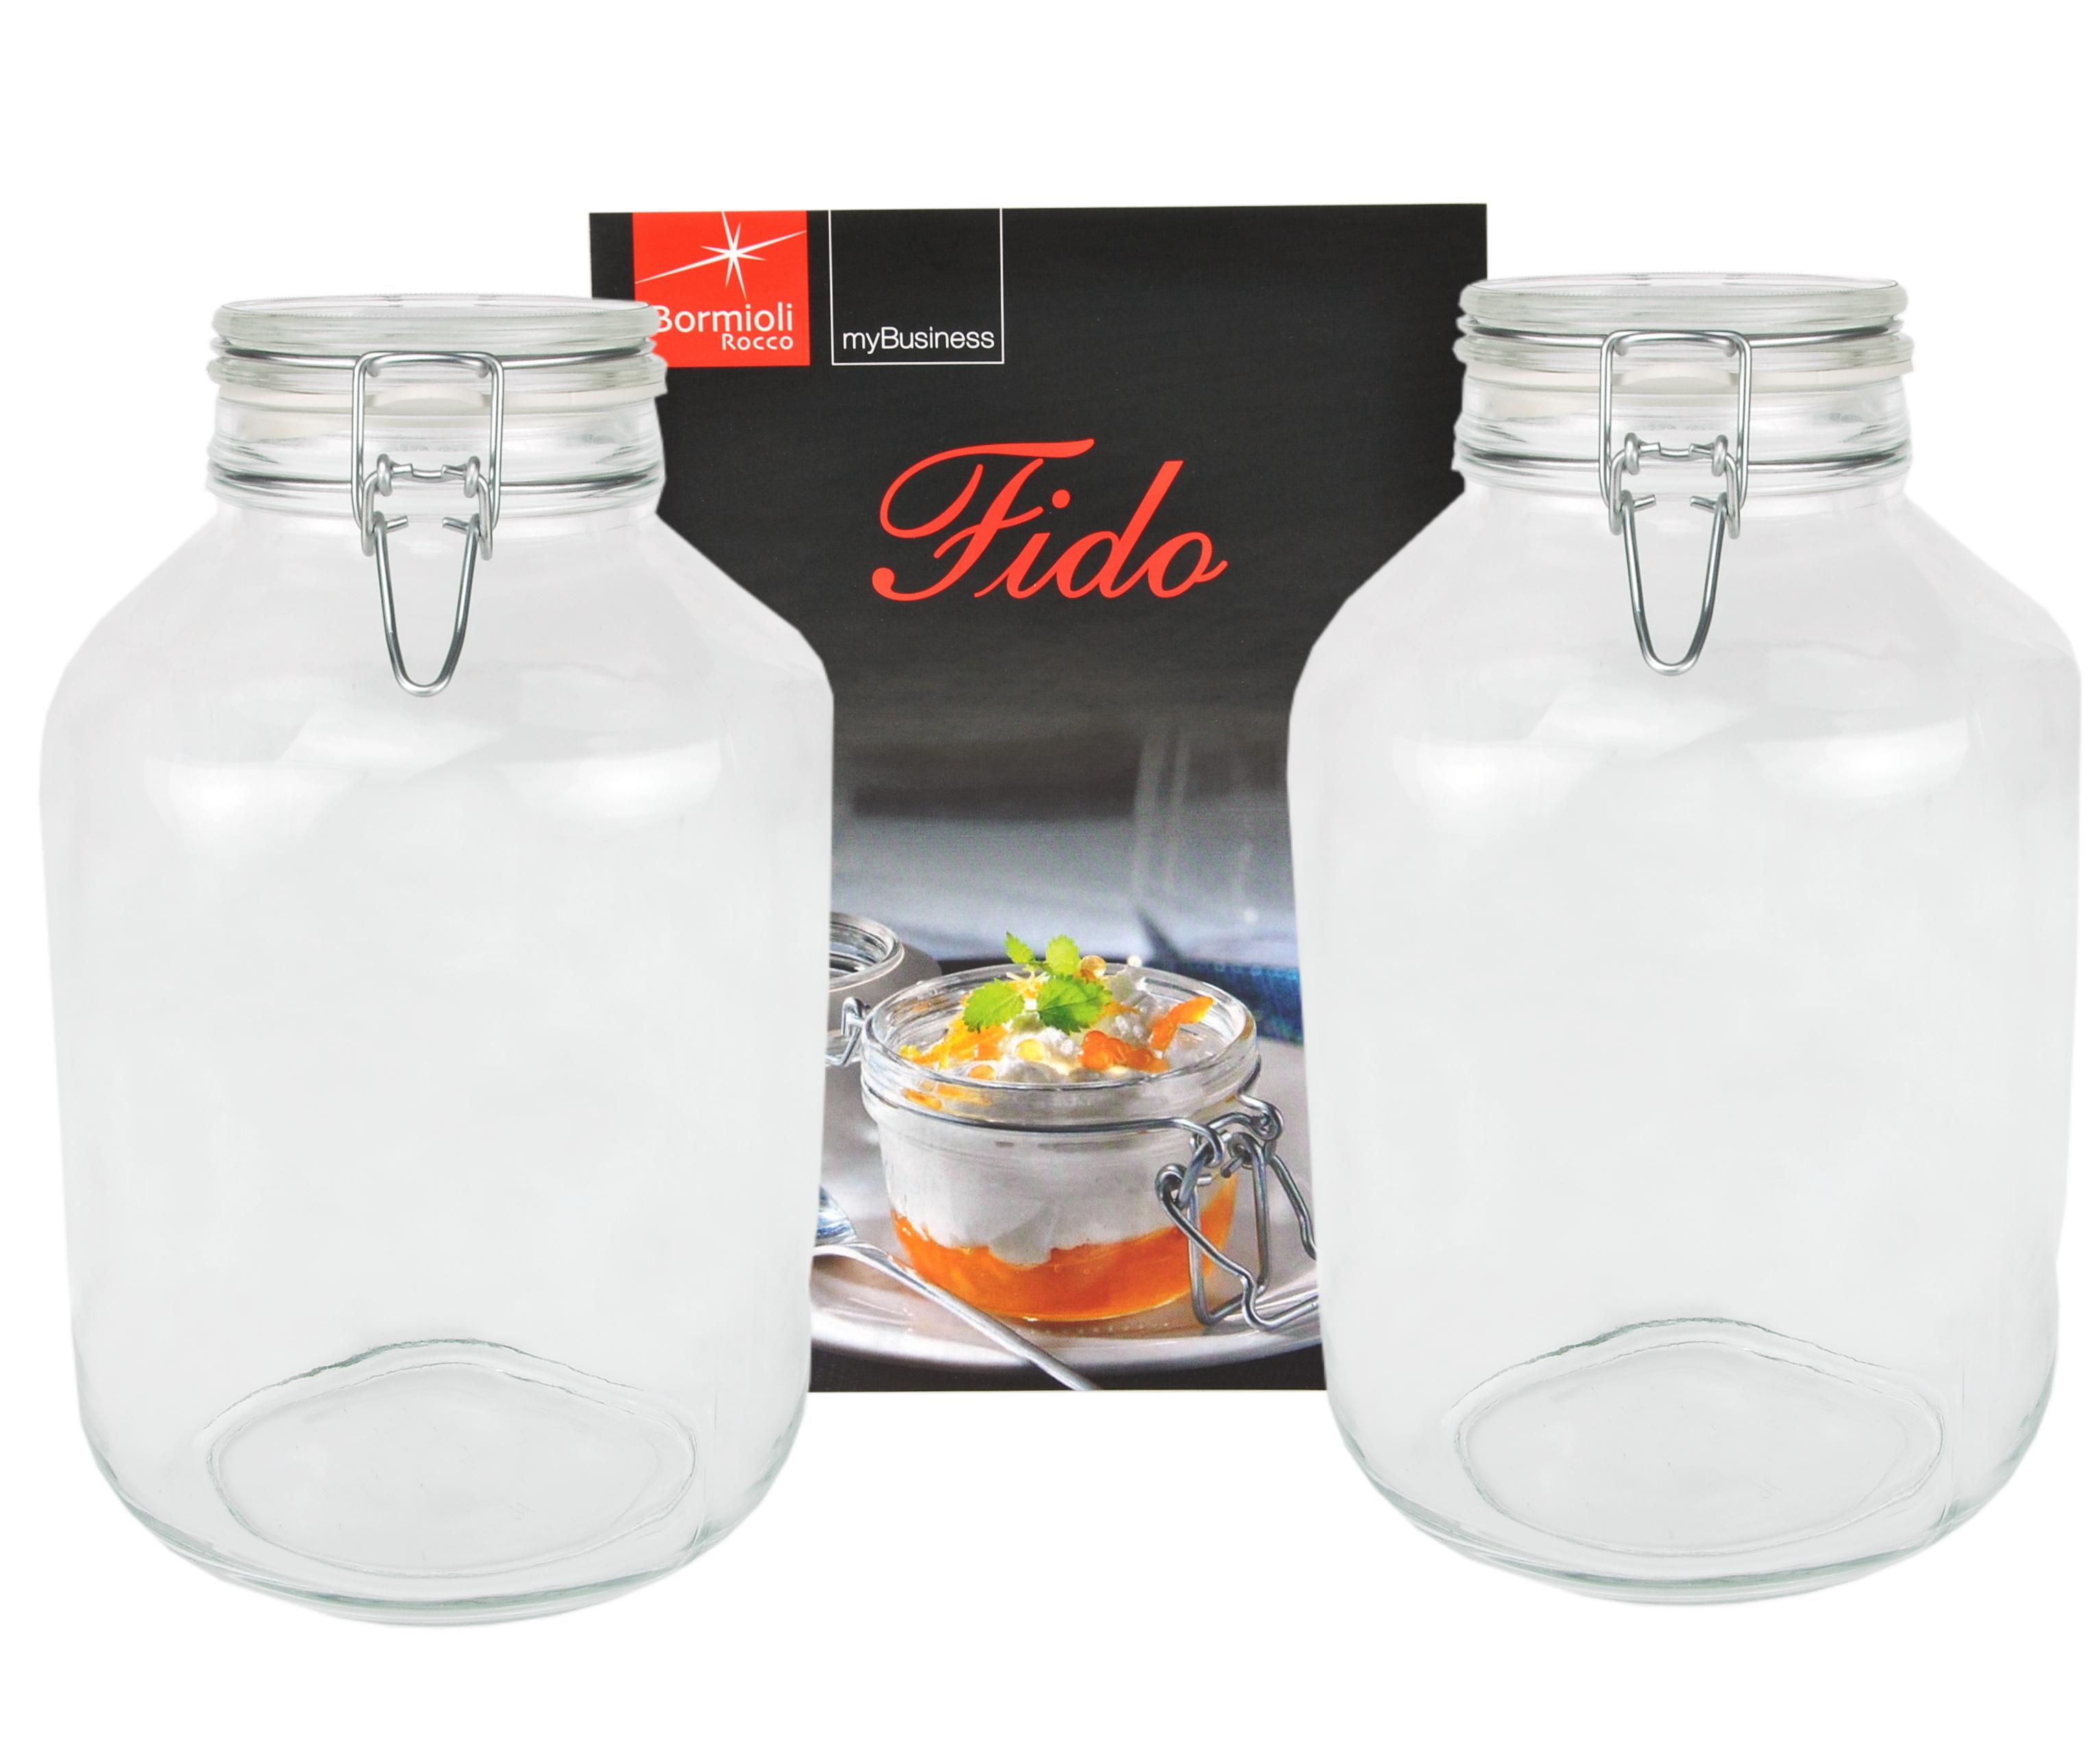 2er set einmachglas b gelverschluss original fido 4 0l. Black Bedroom Furniture Sets. Home Design Ideas